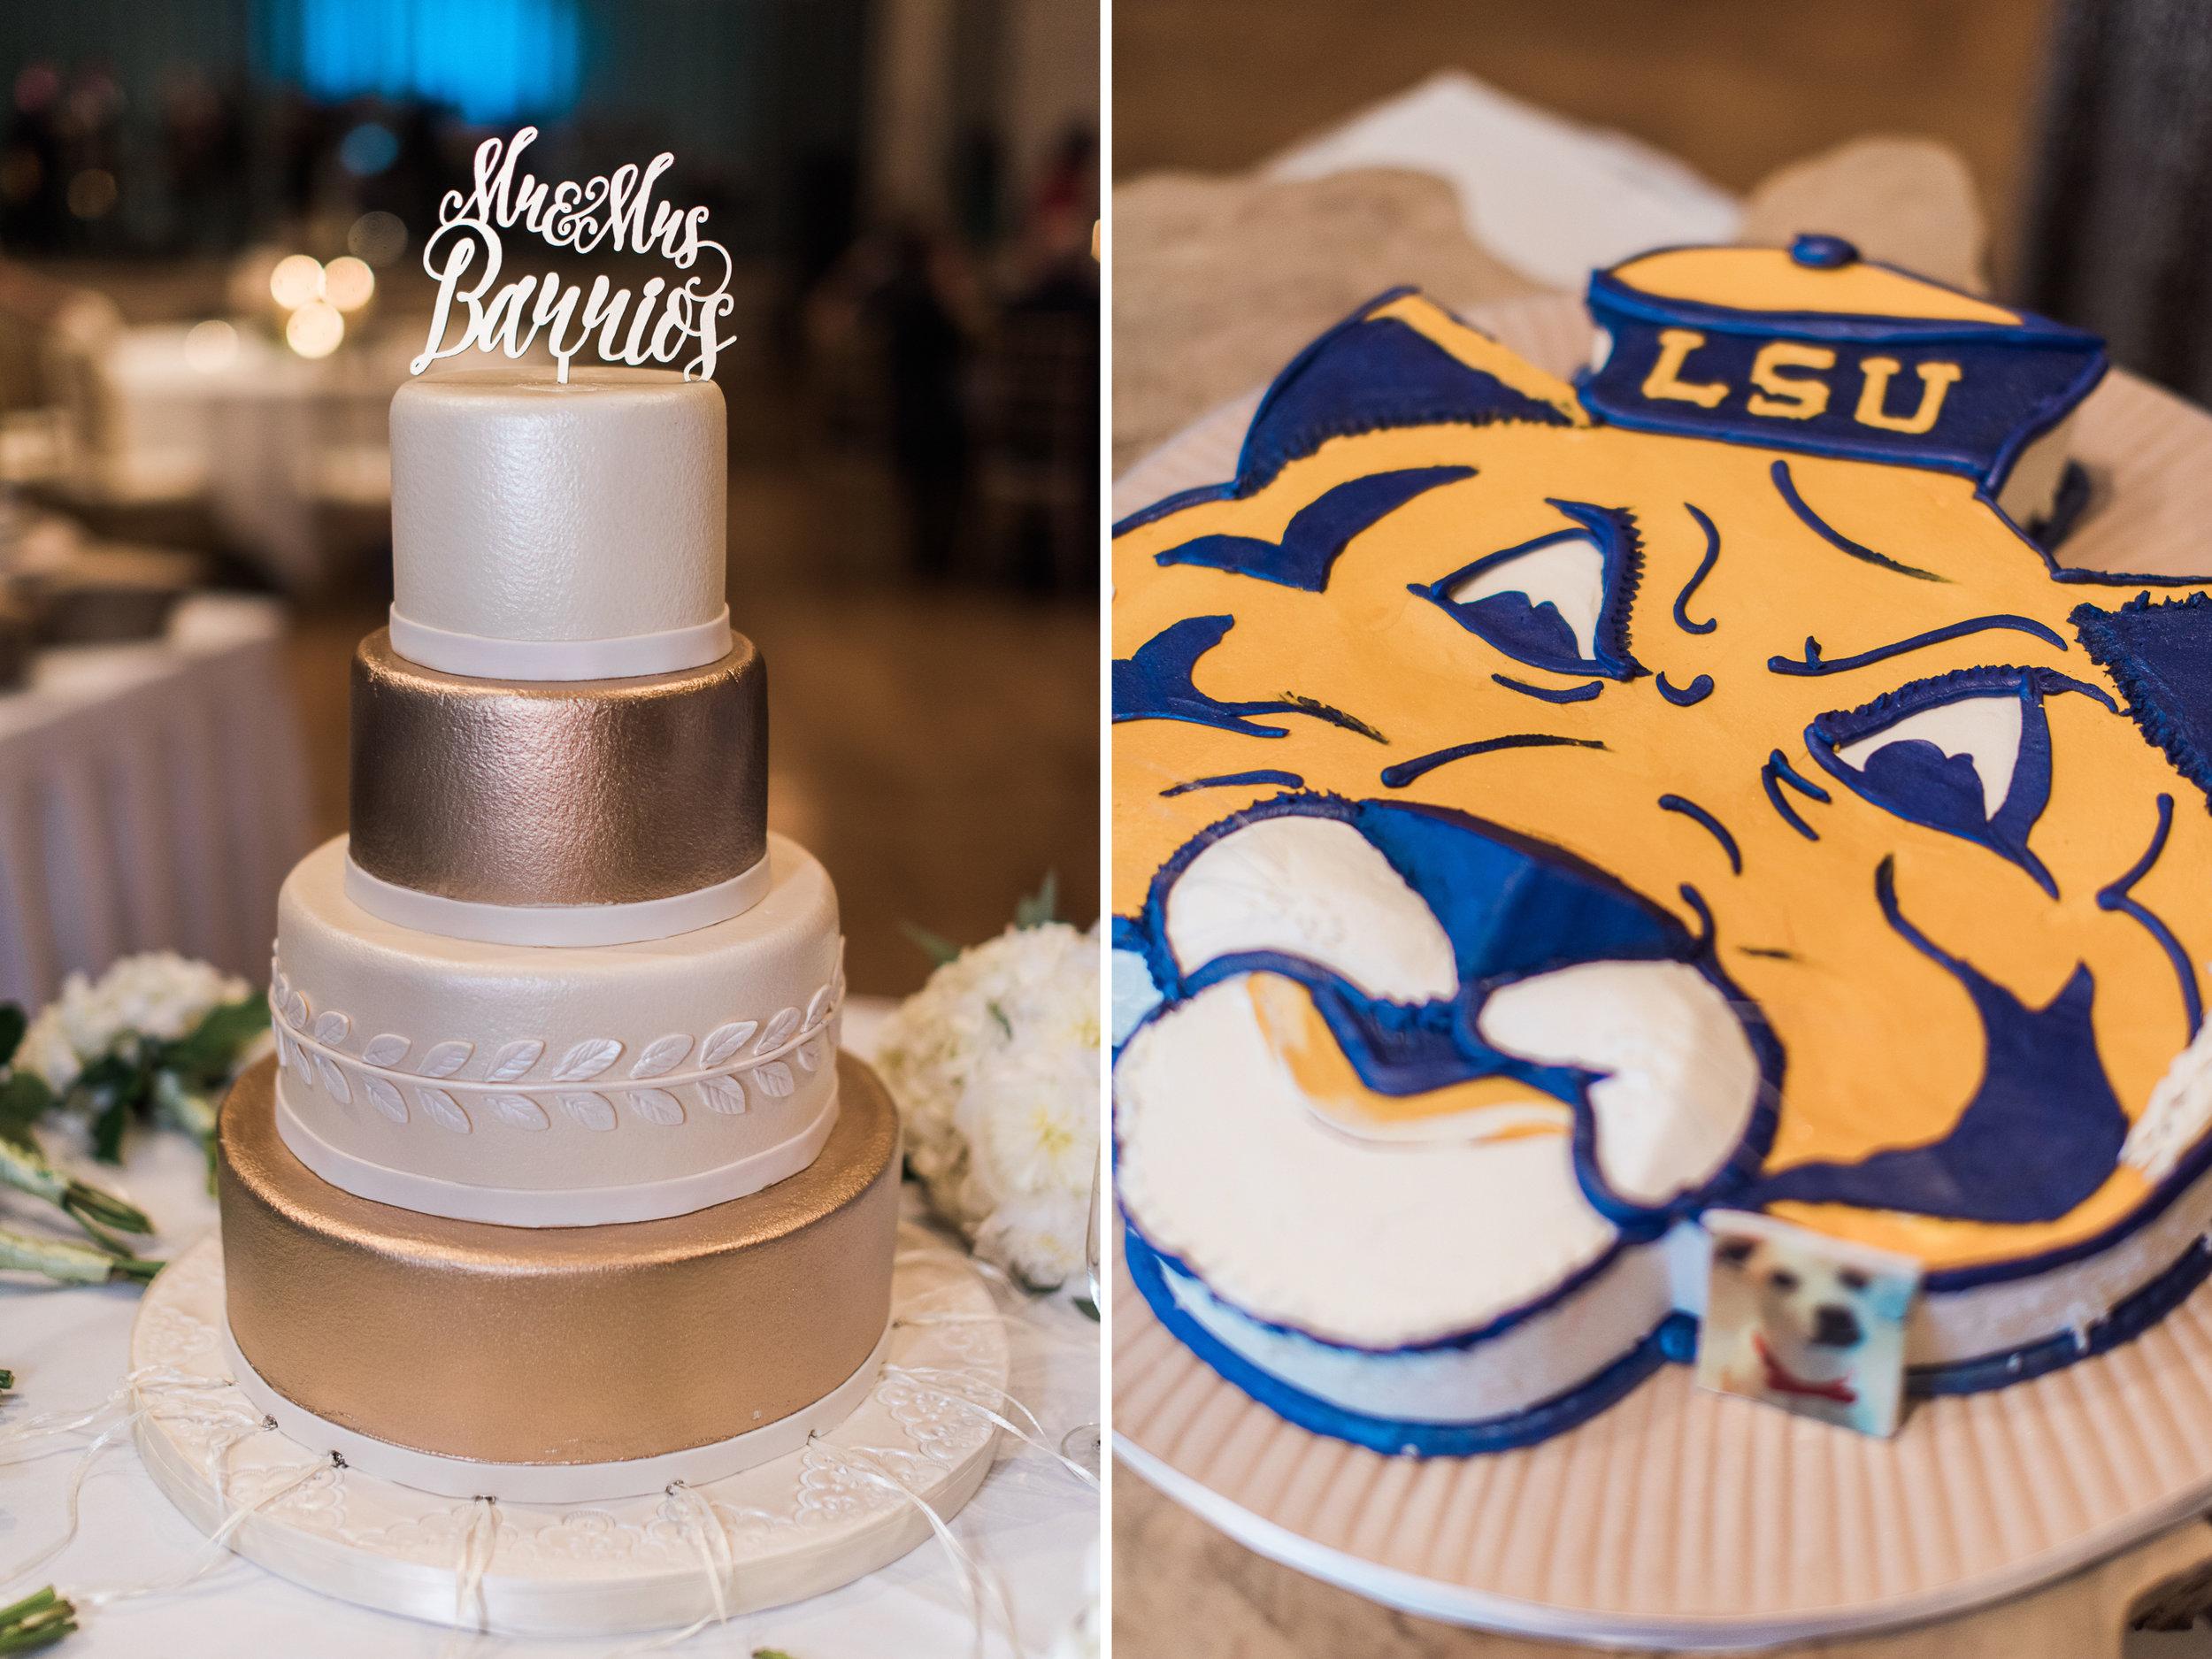 St.-Philip-Presbyterian-Church-Houston-Wedding-Ceremony-The-Junior-League-Of-Houston-Reception-Dana-Fernandez-Photography-Fine-Art-Film-152.jpg